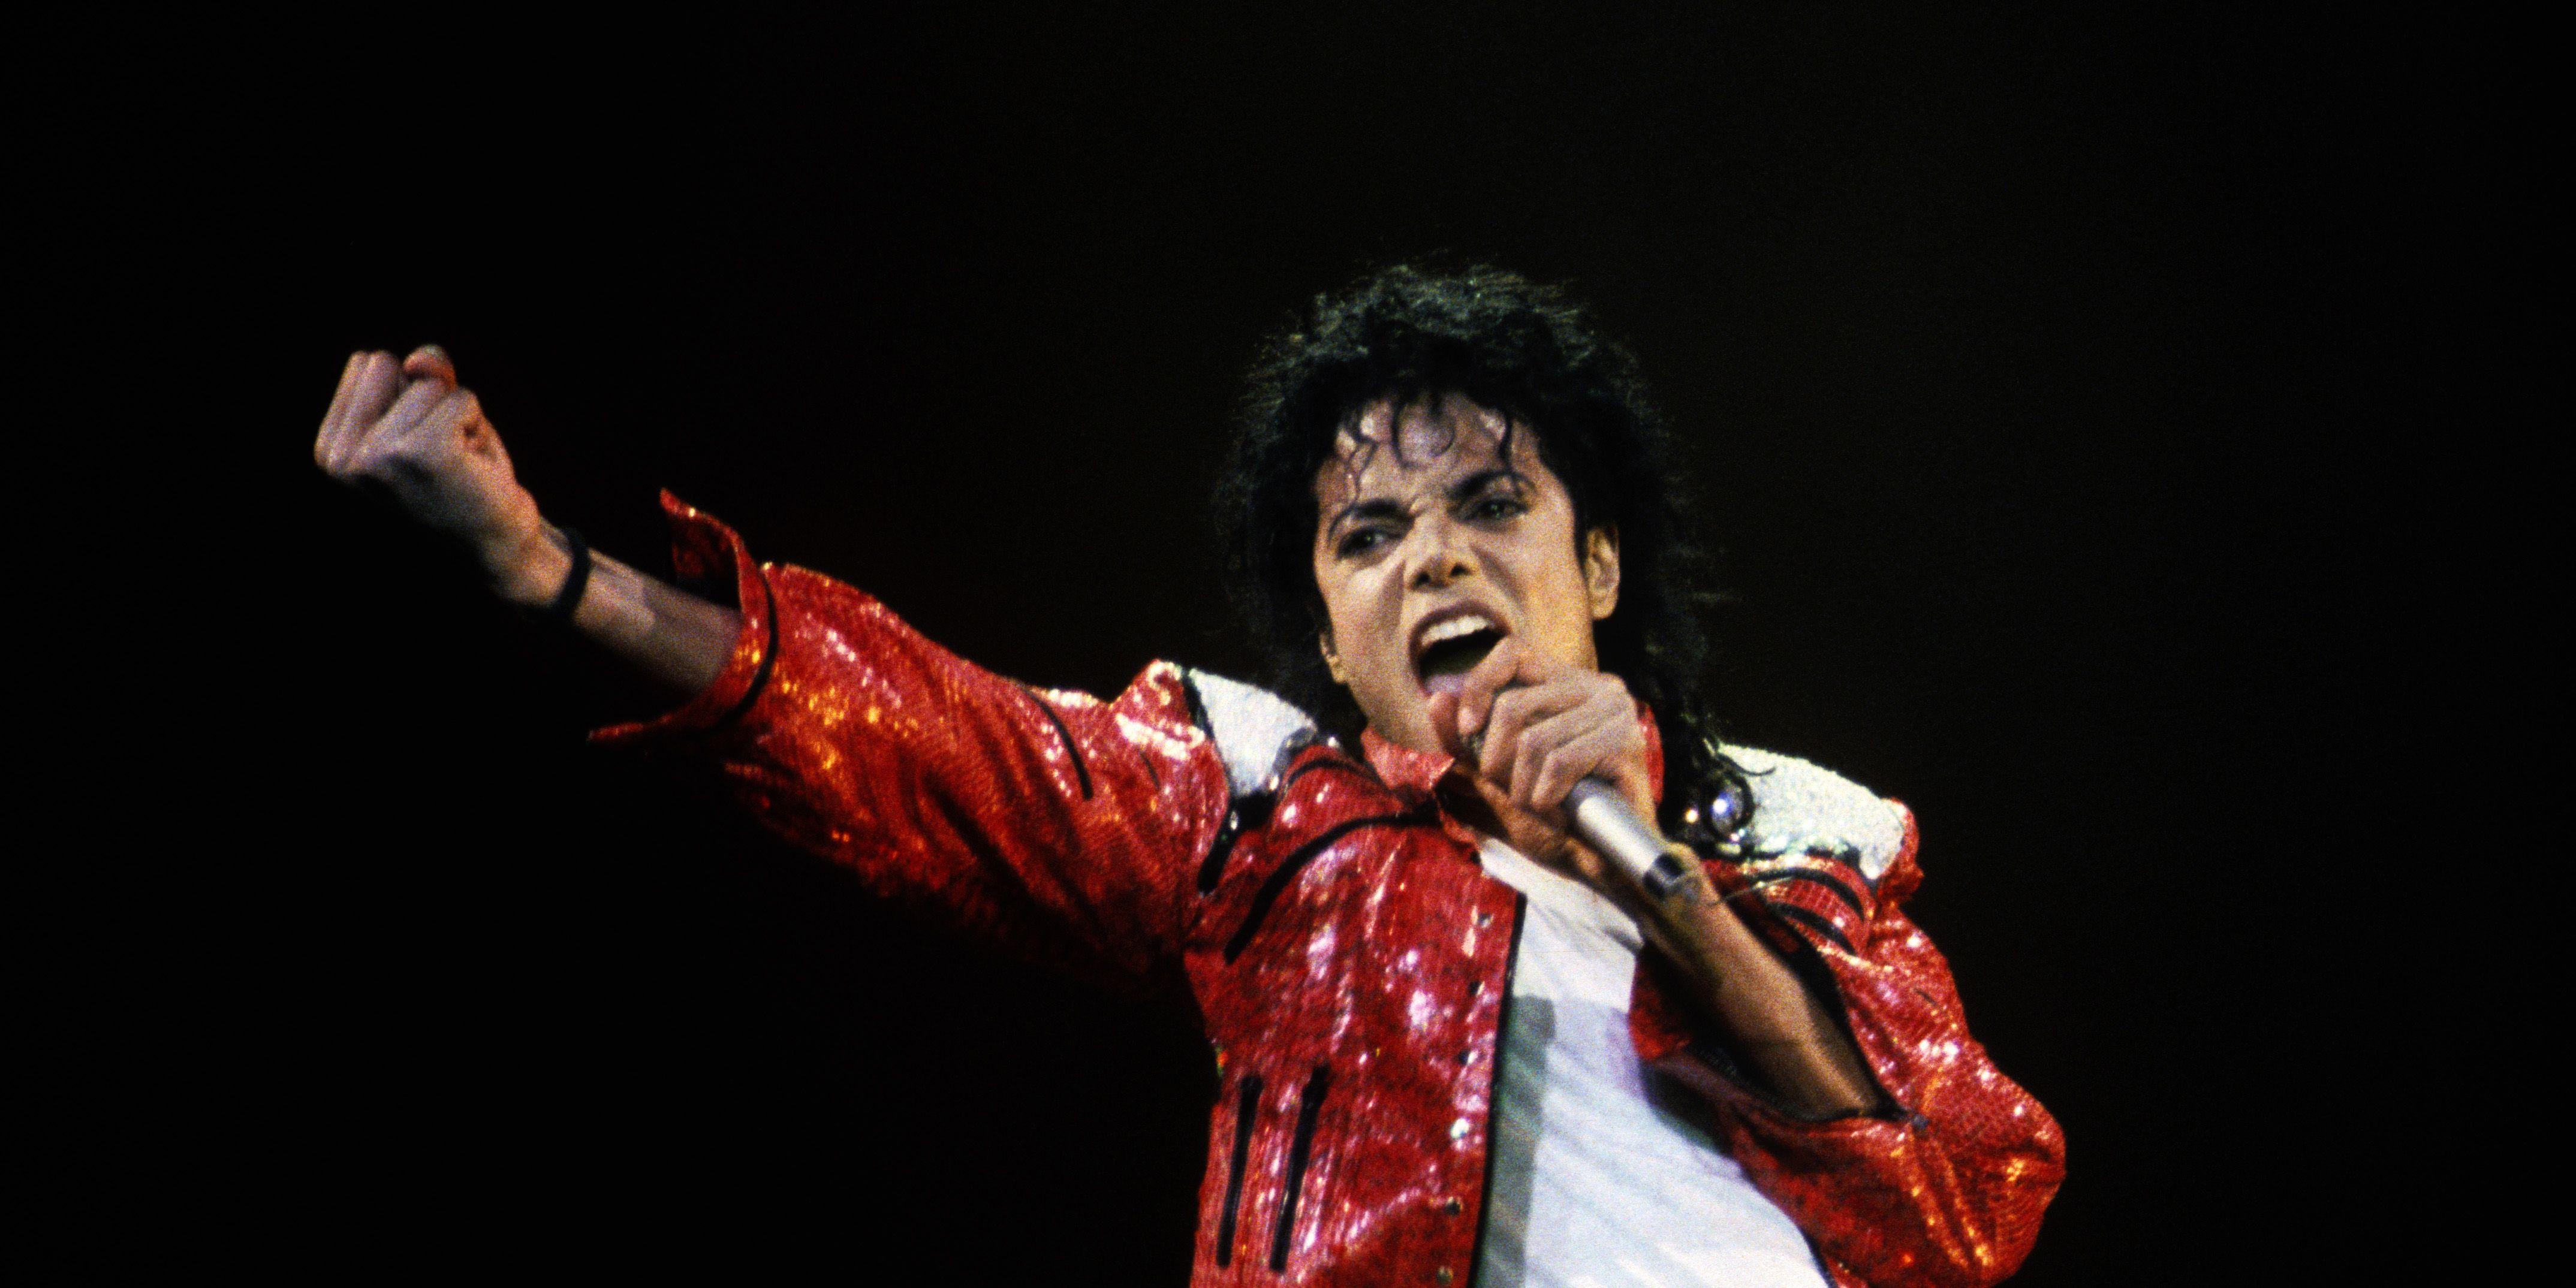 Michael-Jackson-Louis-Vuitton